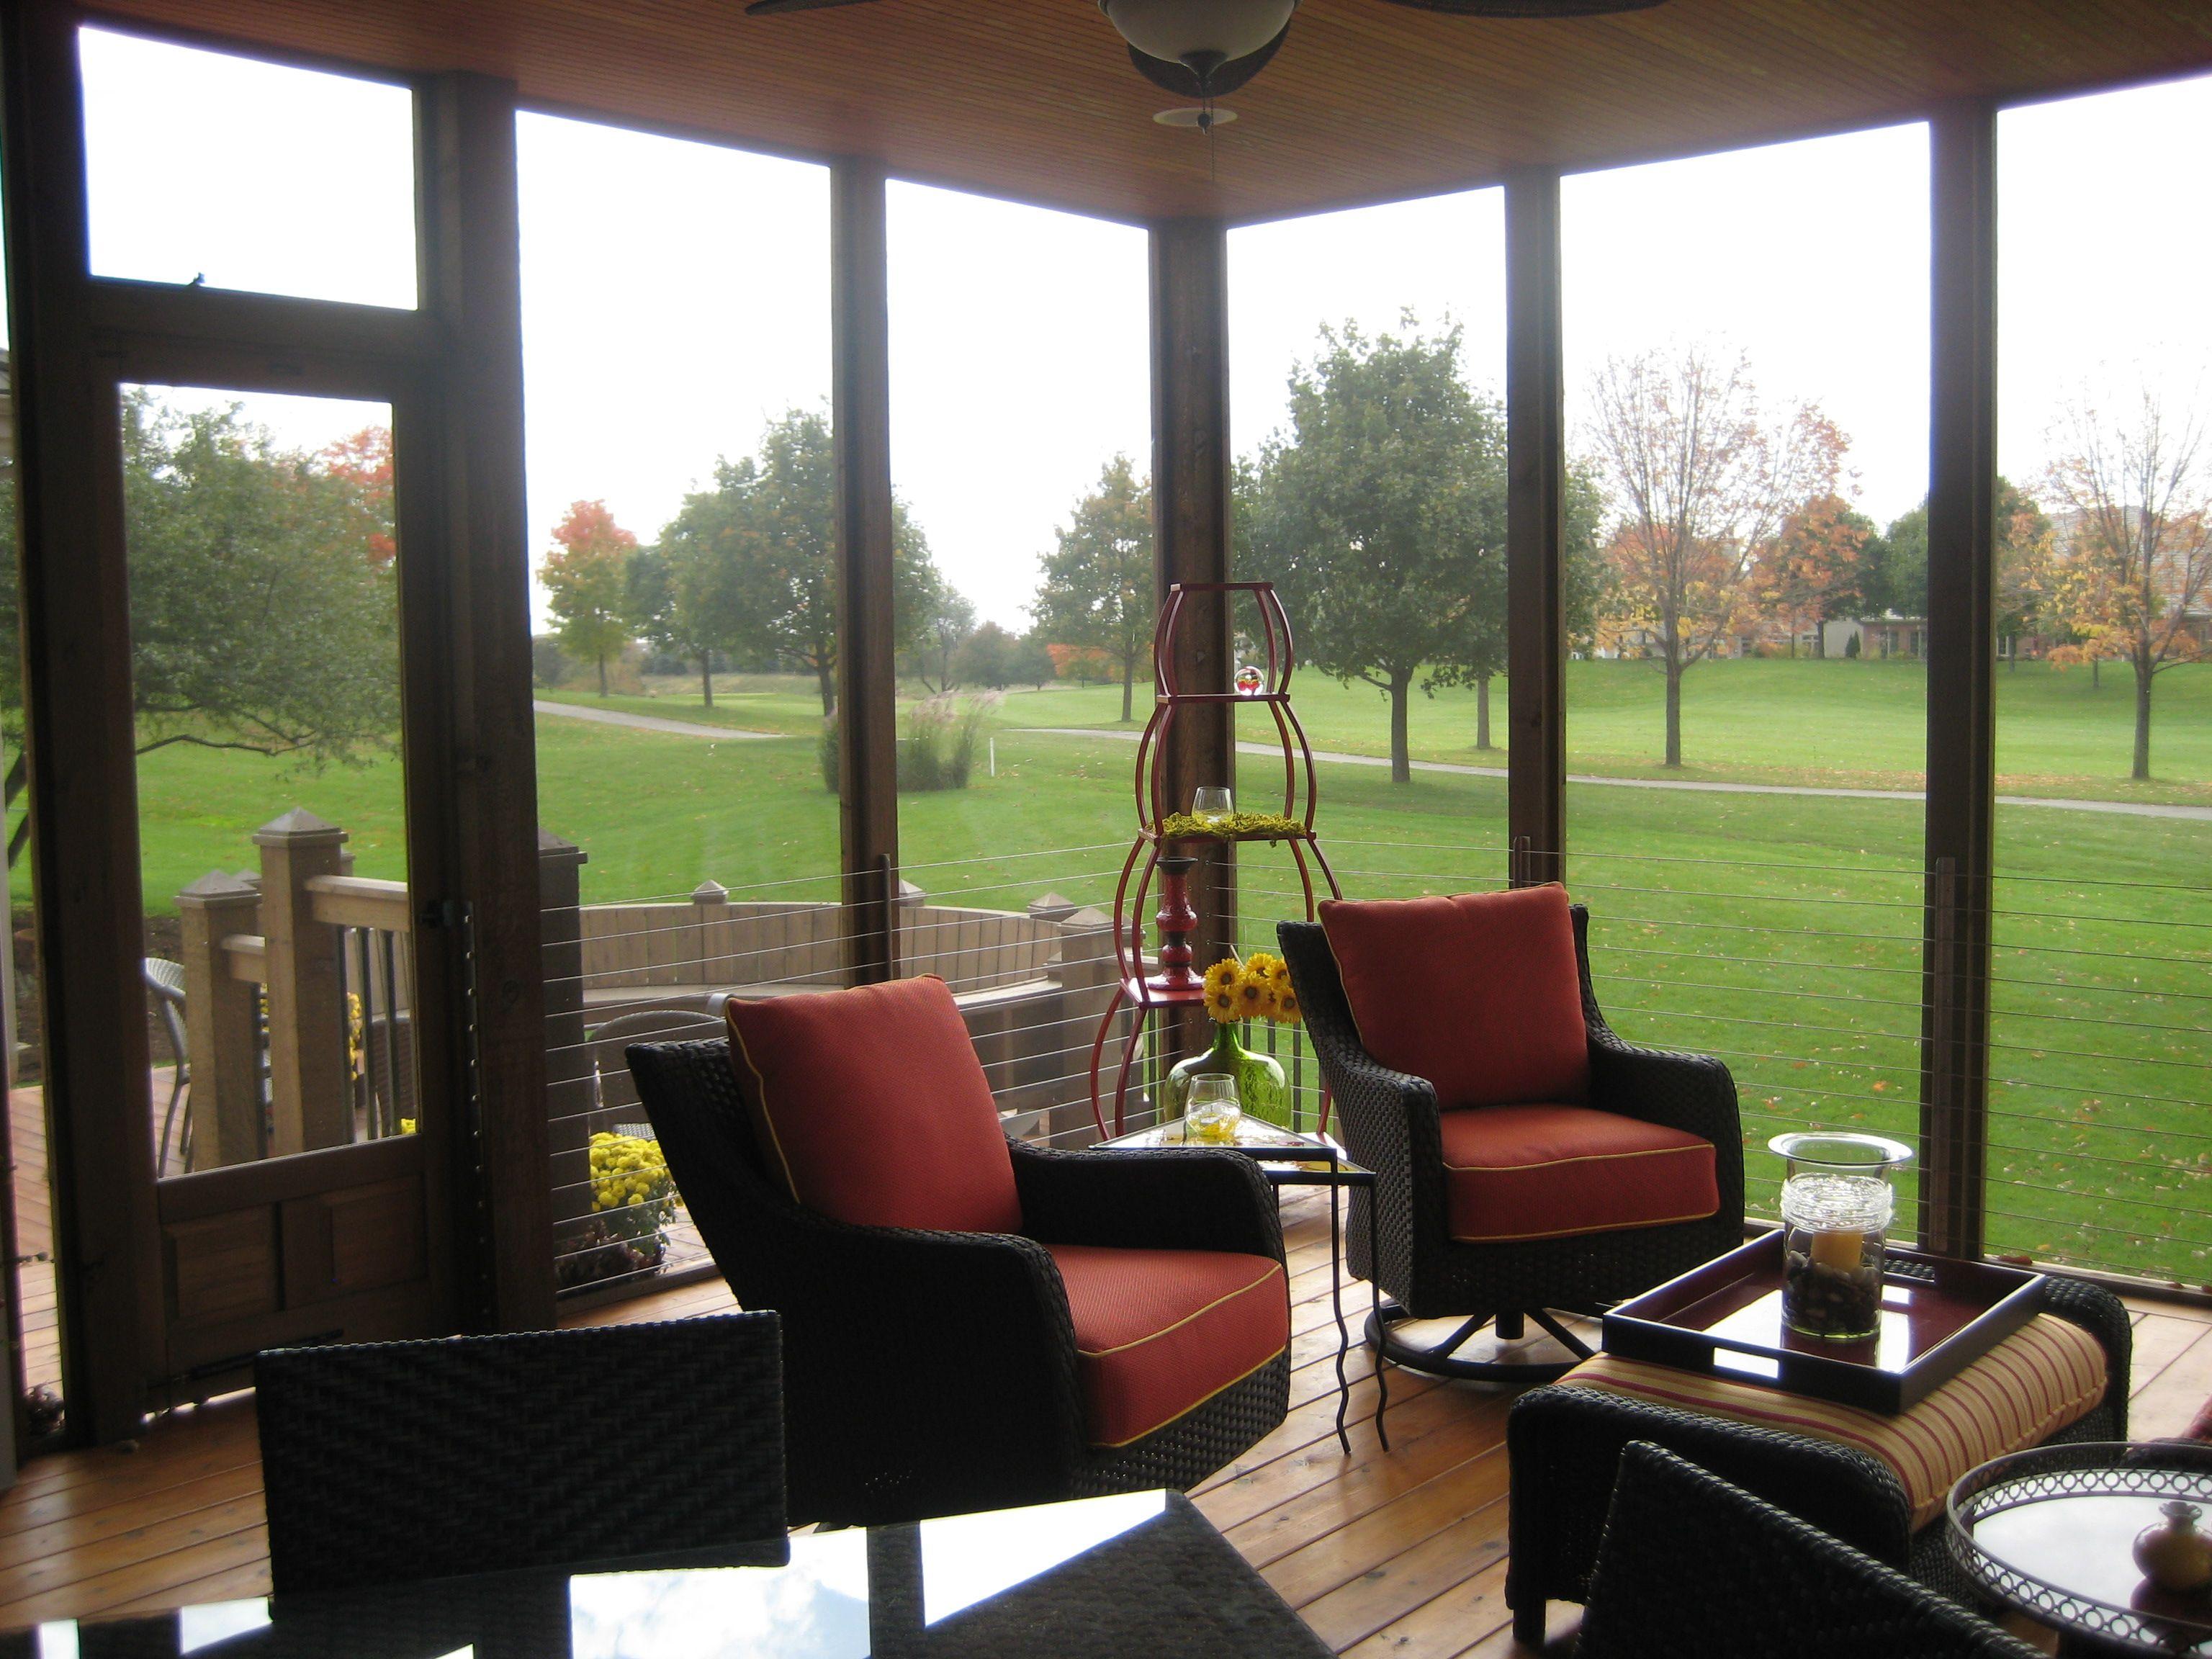 Mccloud Amp Associates Llc Screened Porch With Pergola Roof